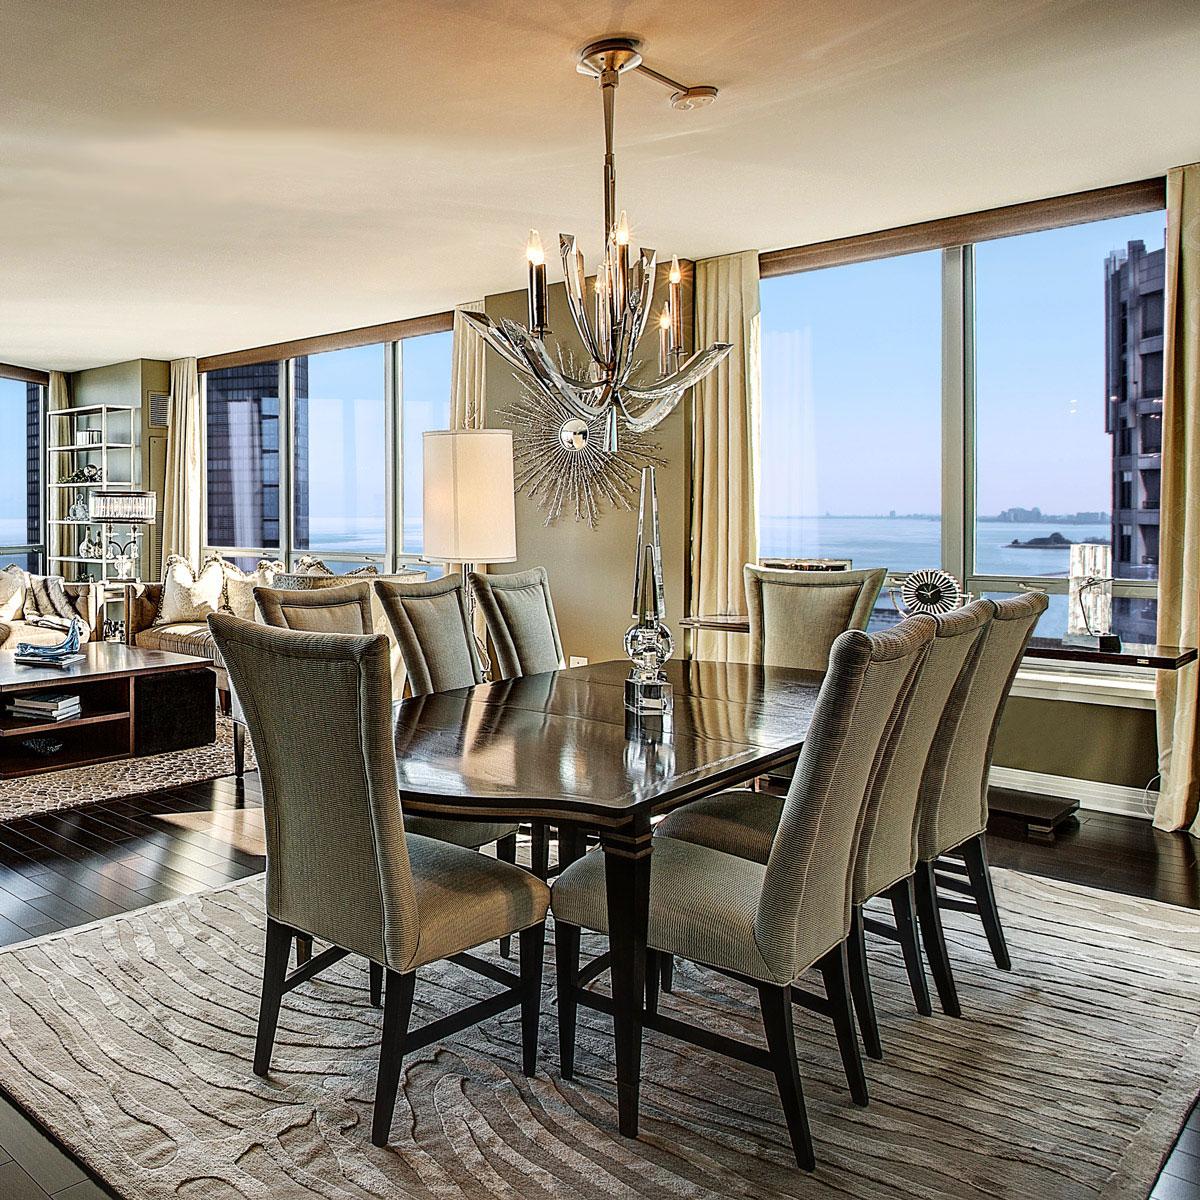 126 Custom Luxury Dining Room Interior Designs: Dining Room Design Projects